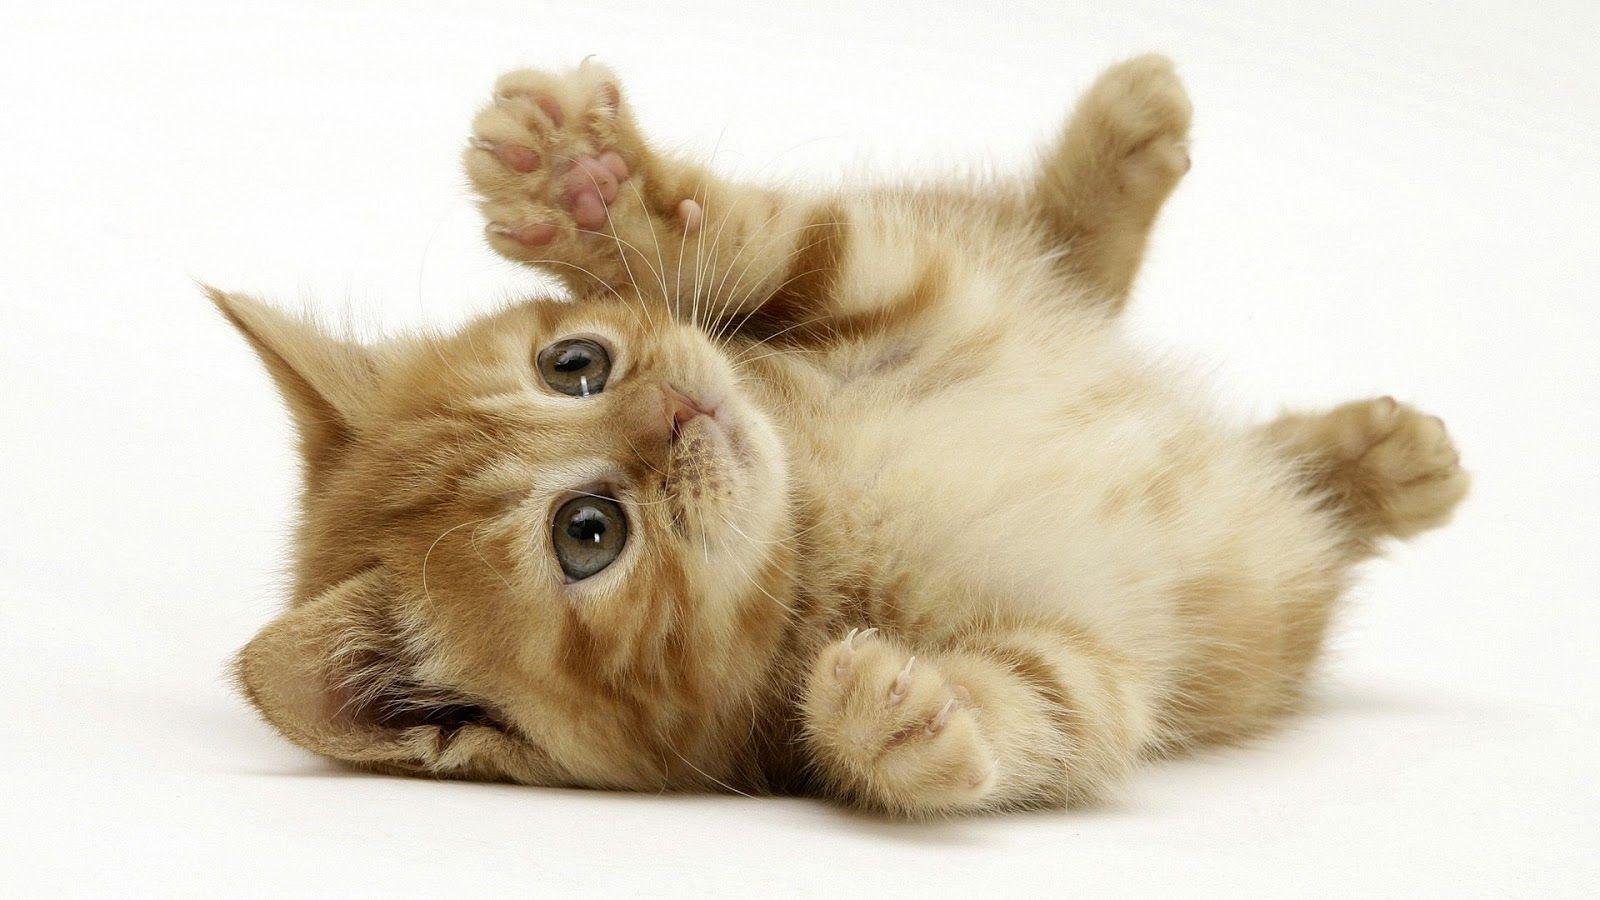 Cute Cats 5 Cute Animals Cute Baby Animals Kittens Cutest